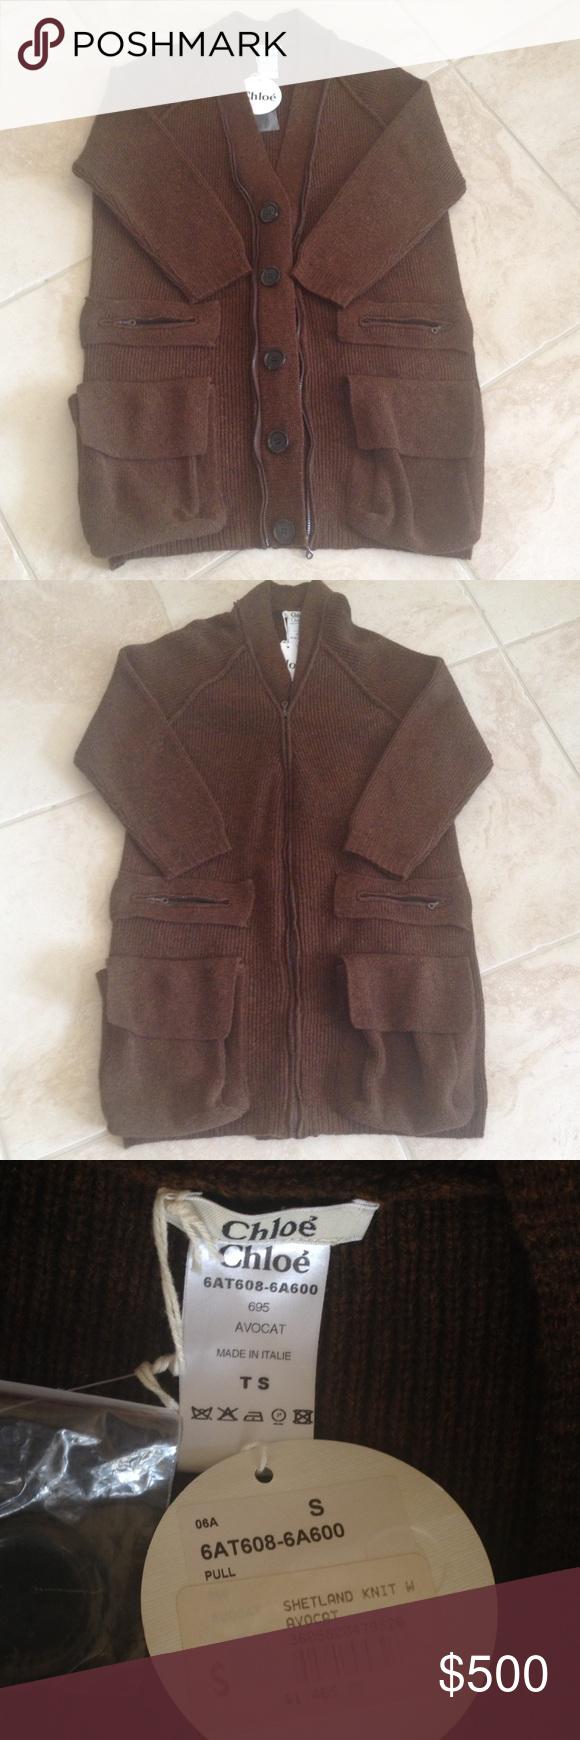 Chloe sweater coat AUTH CHLOE Sweater Coat 100% wool, brand new with tag, retail $1465.00 CHLOE Jackets & Coats